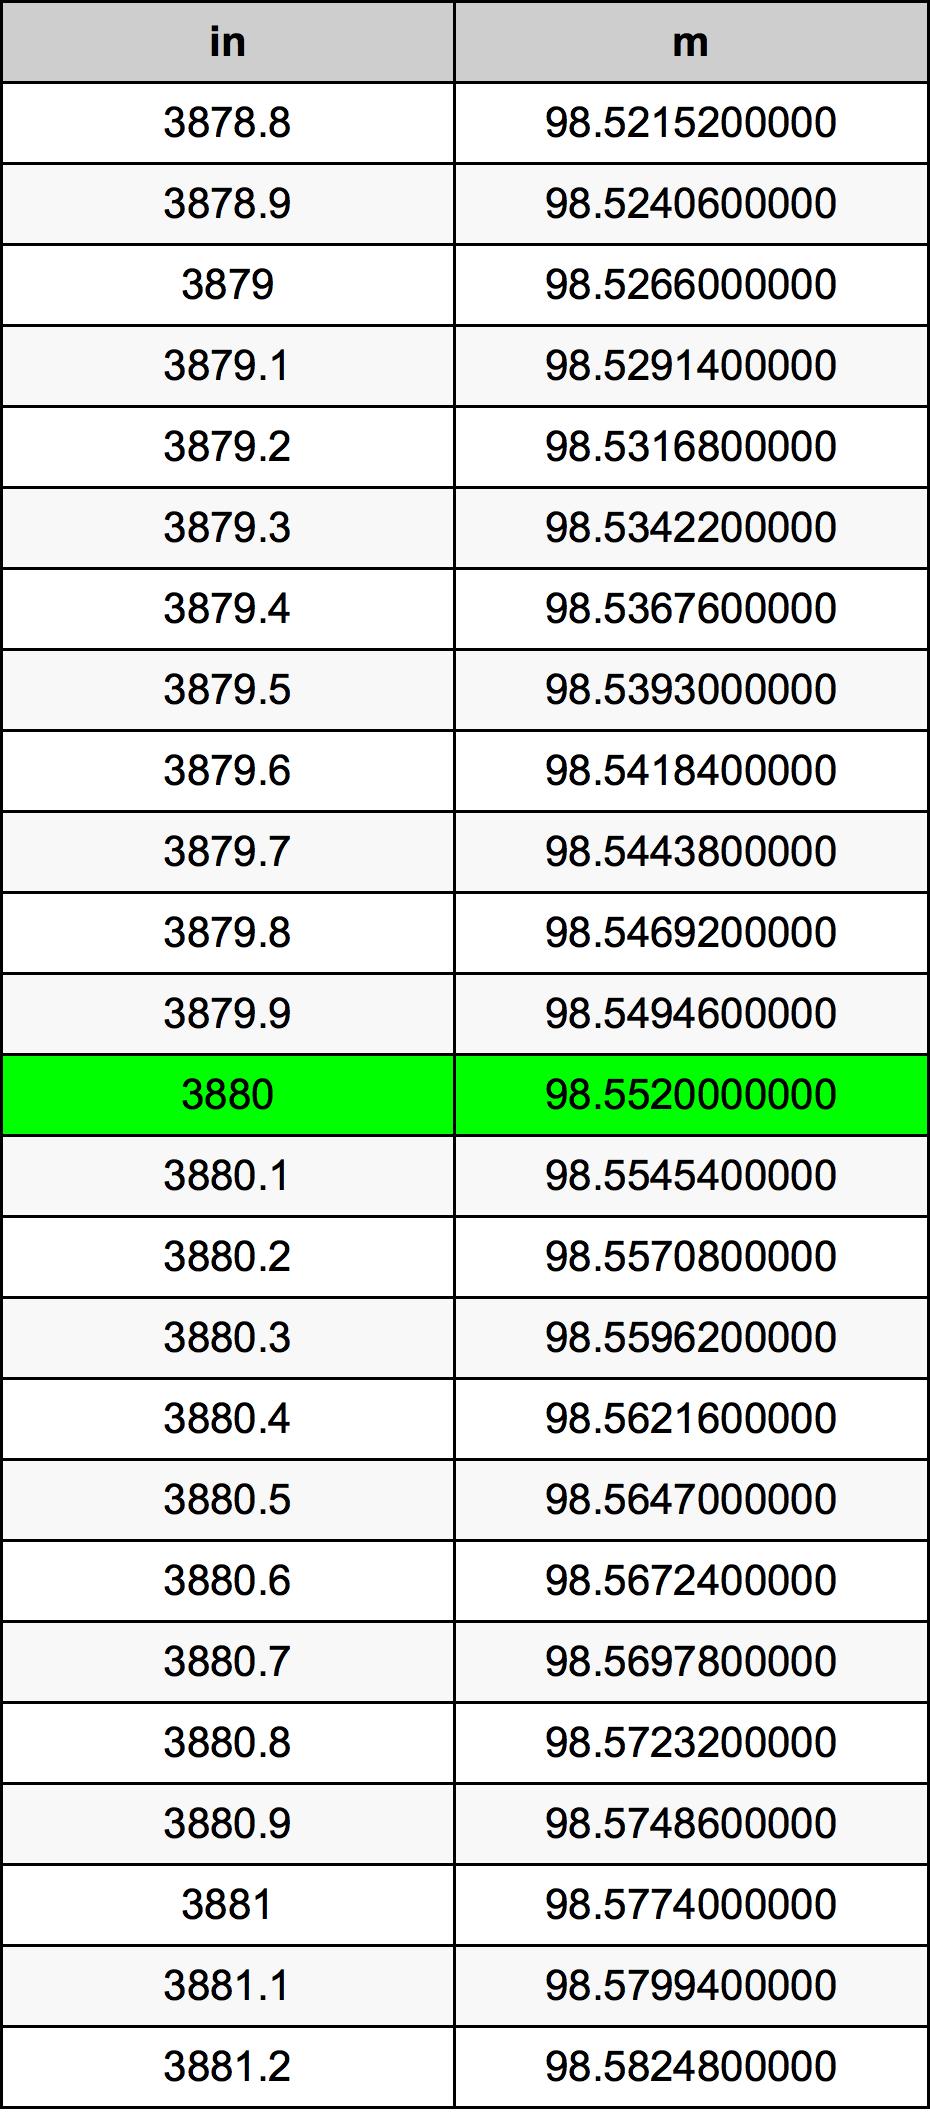 3880 इंच रूपांतरण सारणी